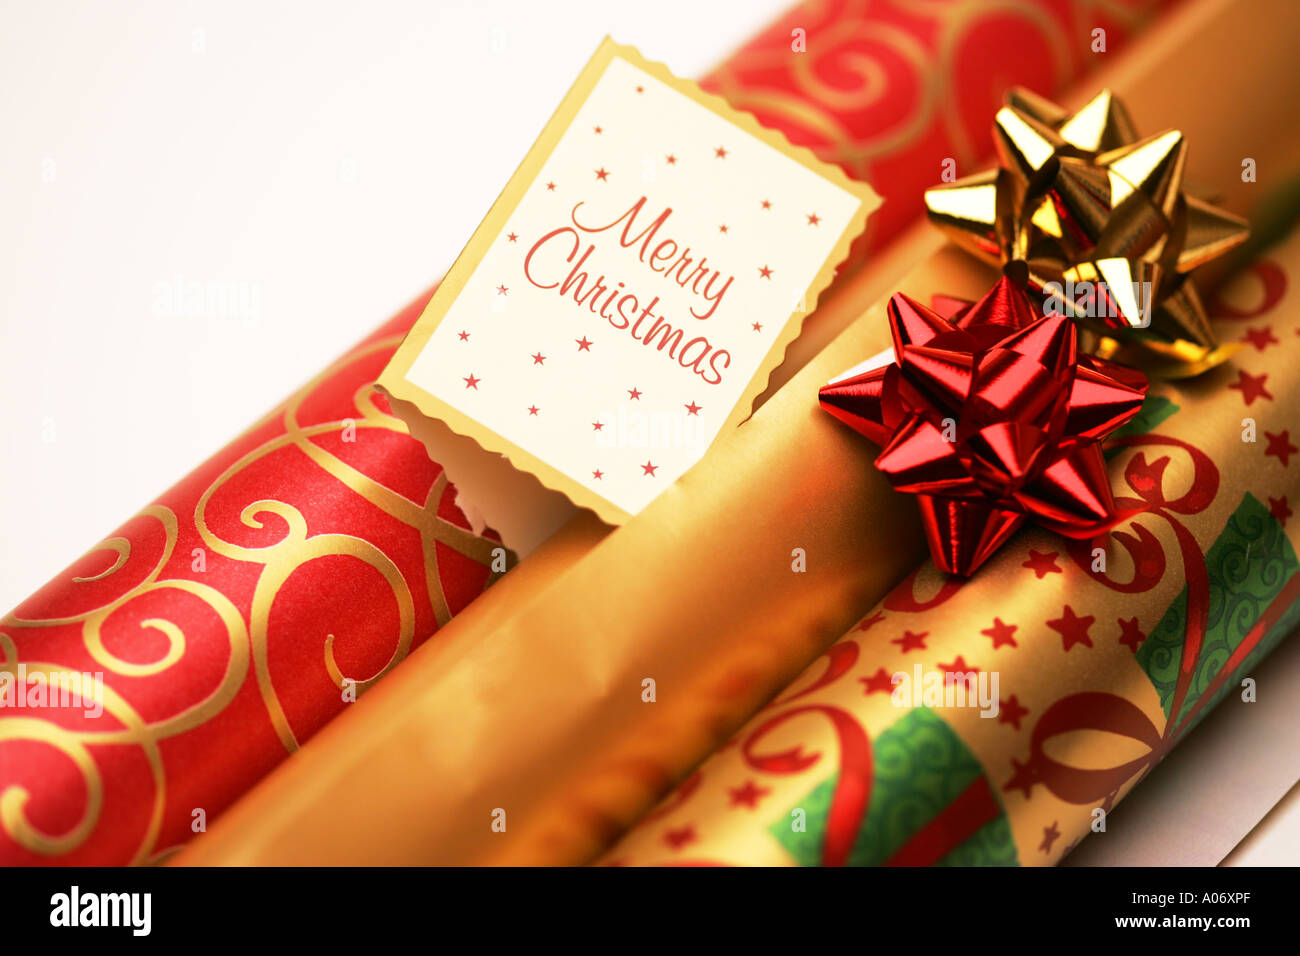 Rolls of festive seasonal xmas christmas gift present wrapping paper rolls of festive seasonal xmas christmas gift present wrapping paper and matching red gold ribbon bows and gift tag negle Choice Image